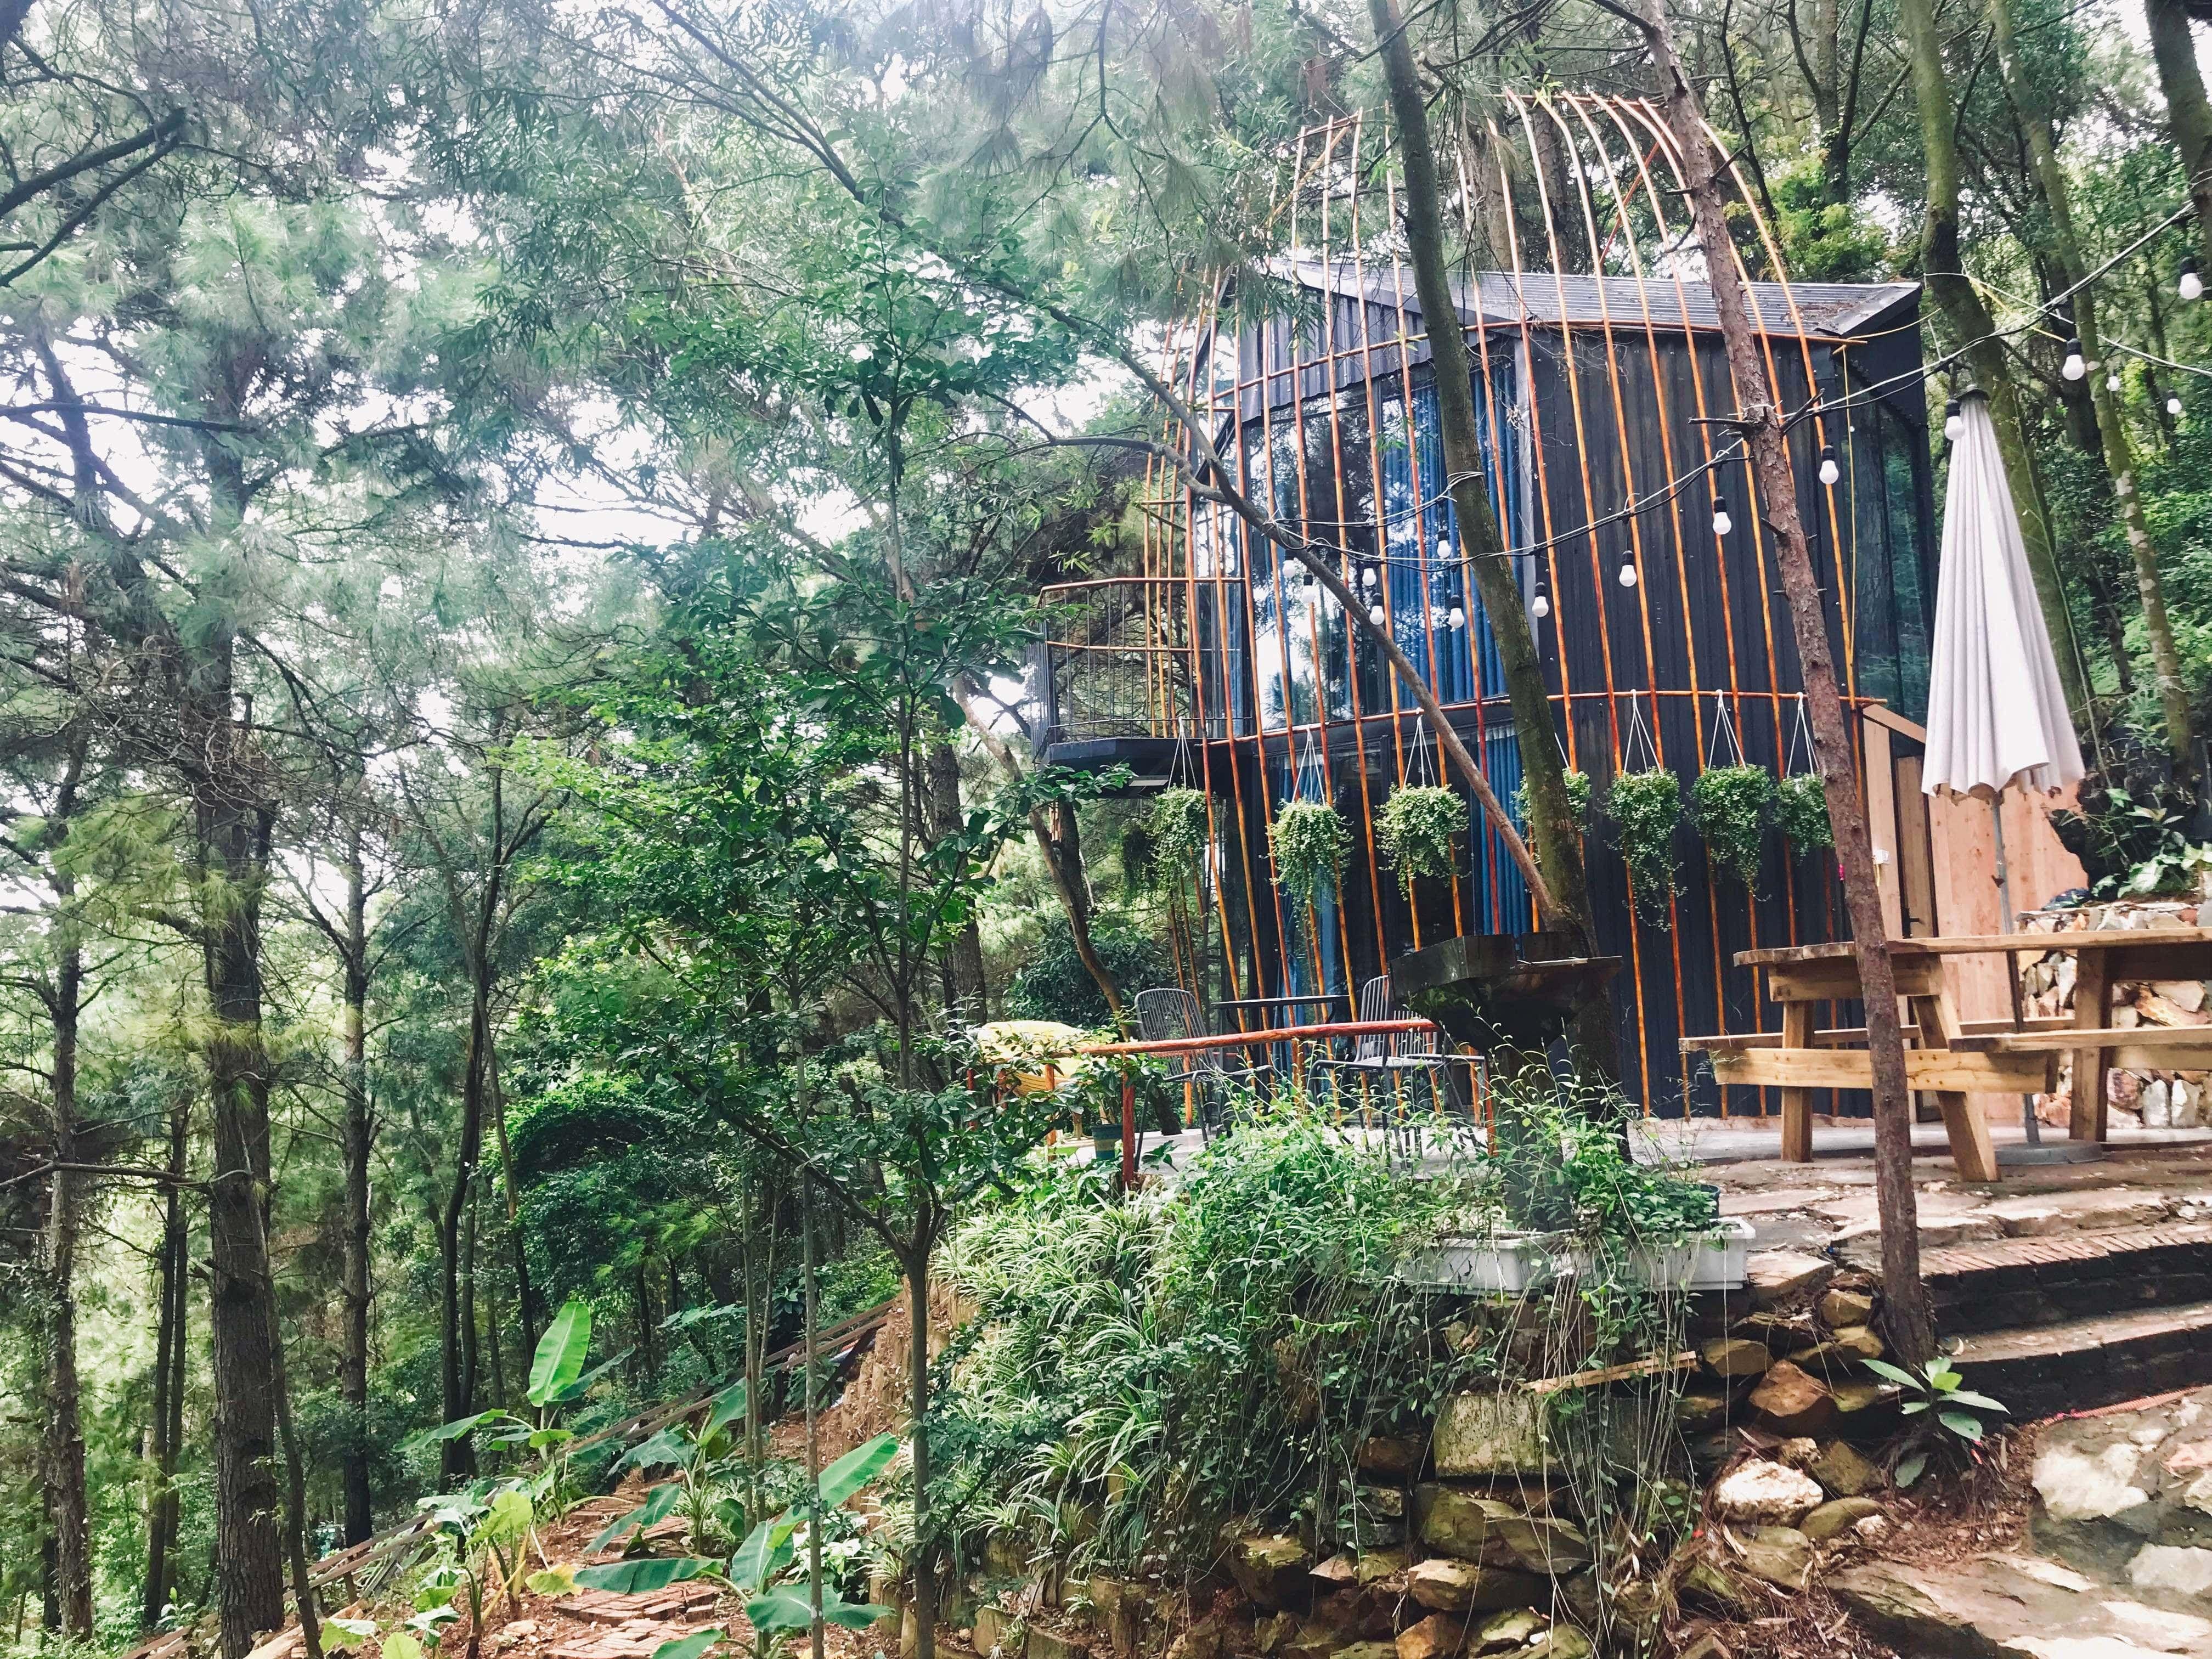 khong-gian-nha-to-chim-debay-villa-homestay-soc-son-ha-noi-01